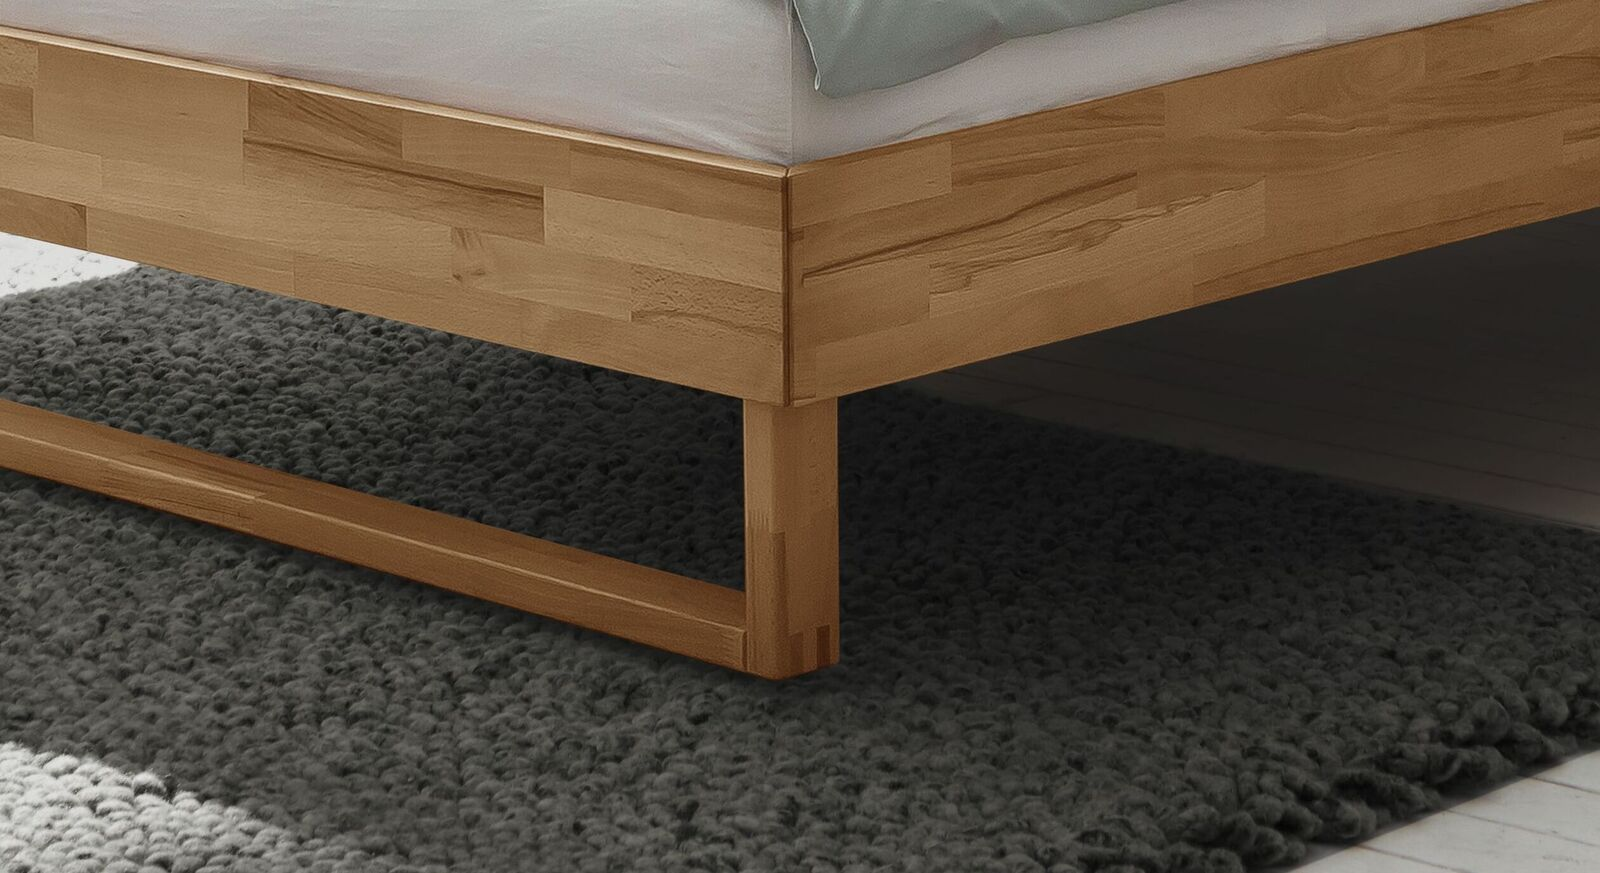 Bett Kian mit modernen Holzkufen